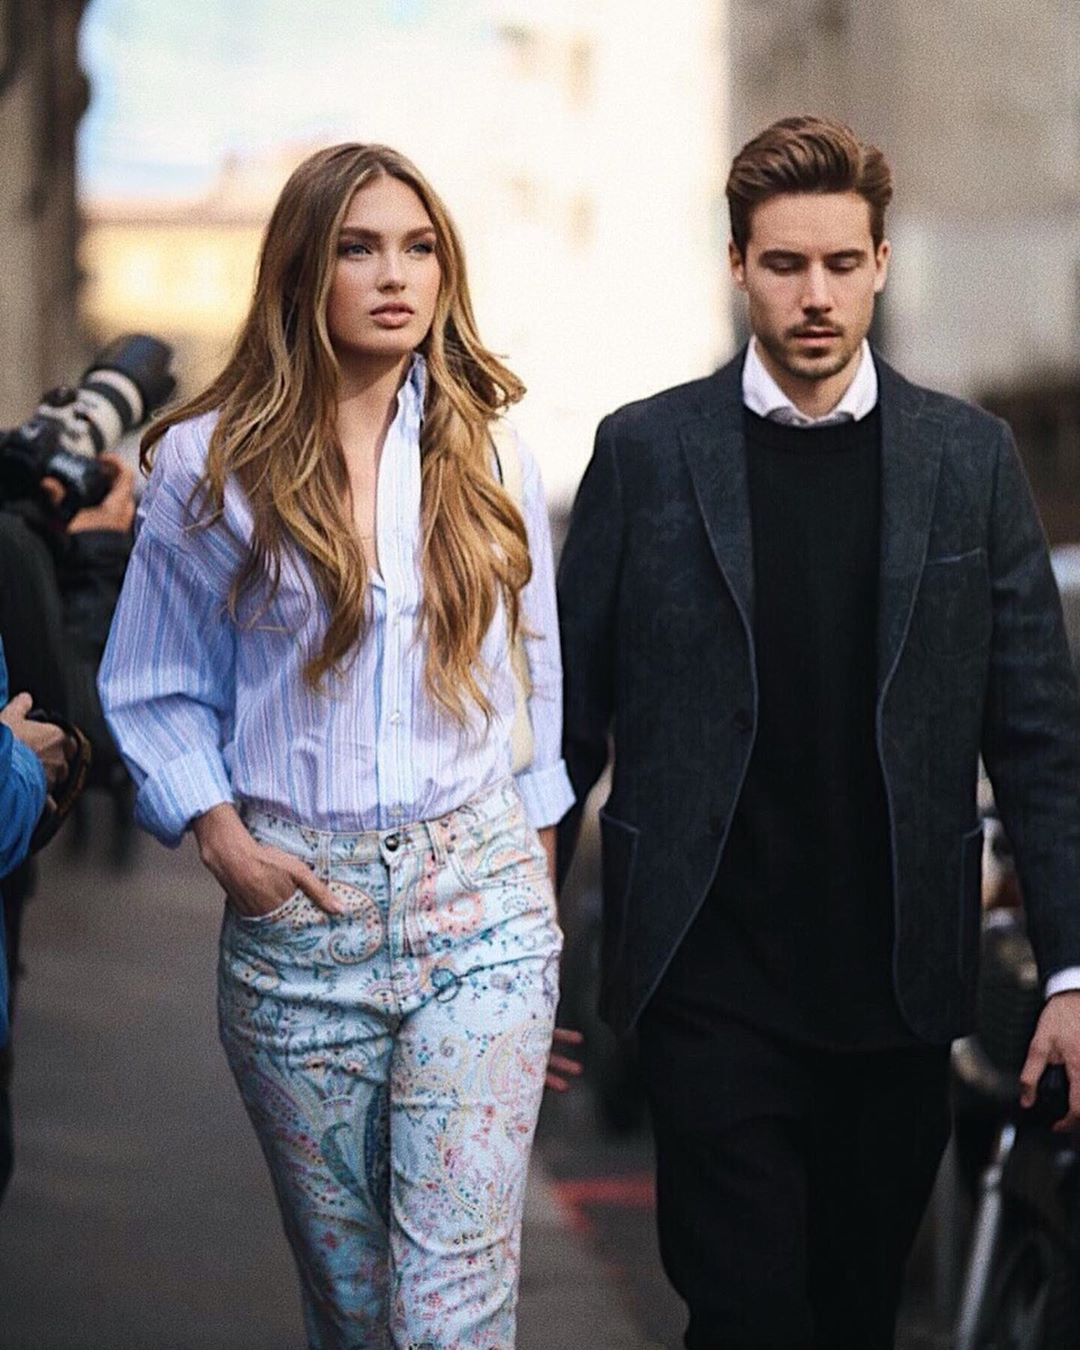 Romee Strijd formal wear, blazer, jeans colour combination